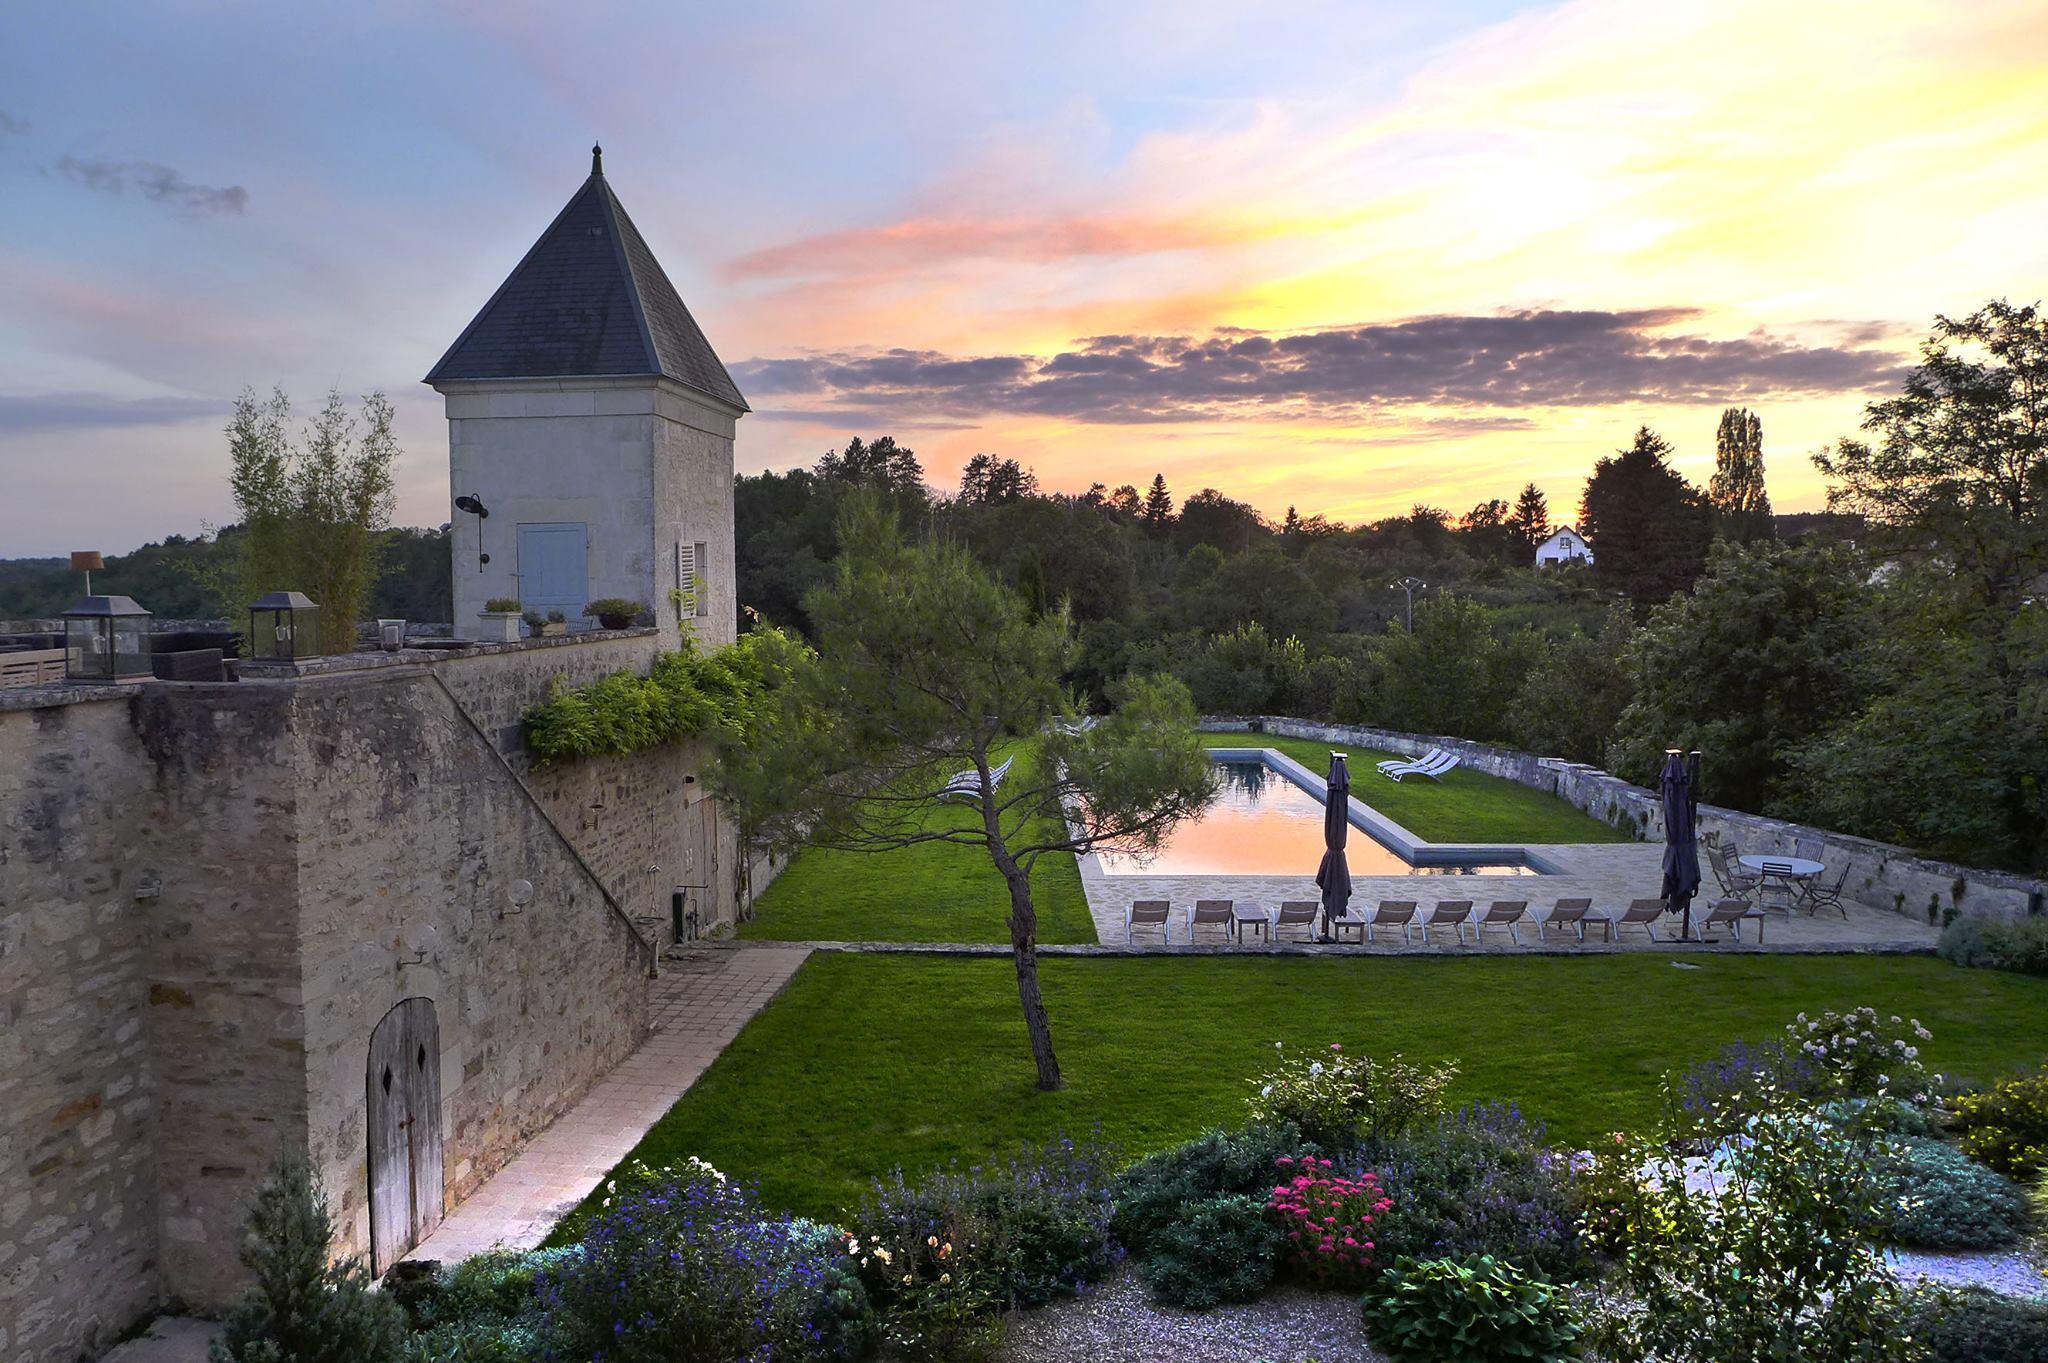 Chateau_Pool Garden_ Sunset.jpg